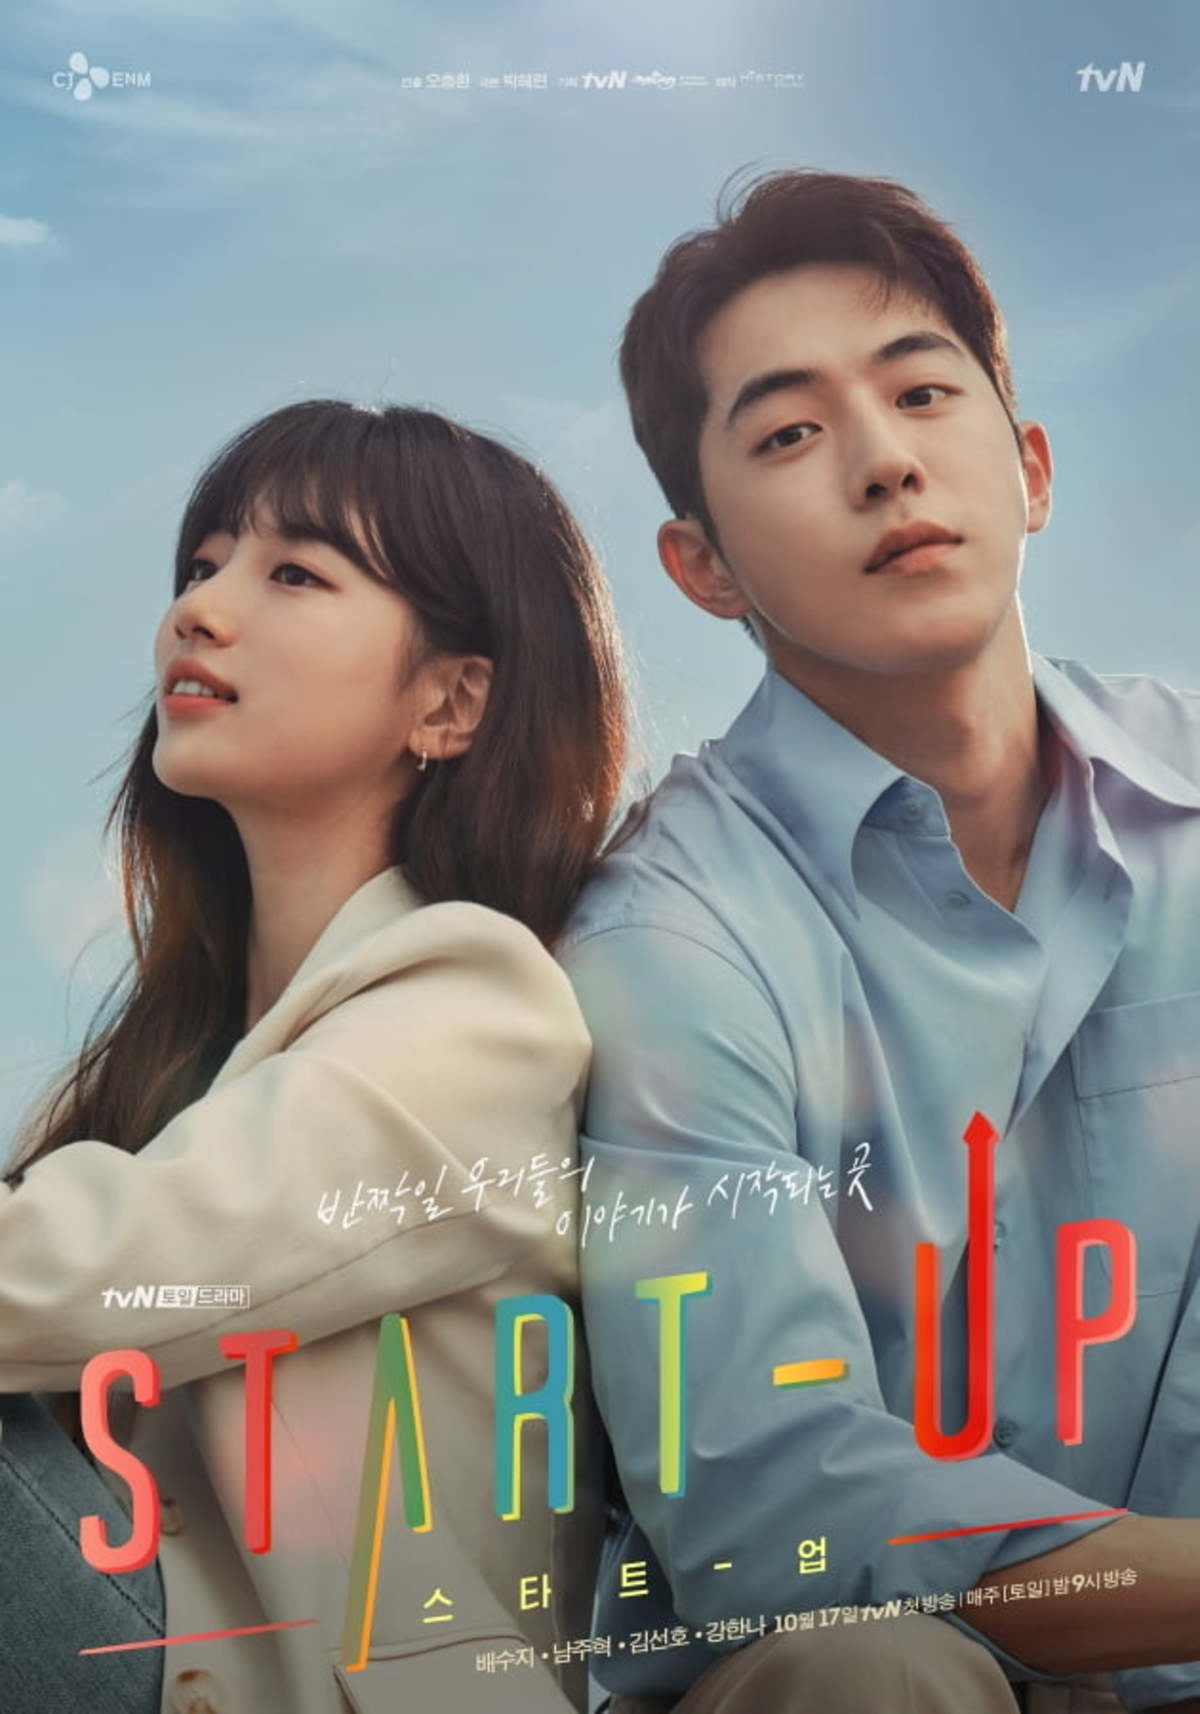 Khởi Nghiệp - Start Up (2020)